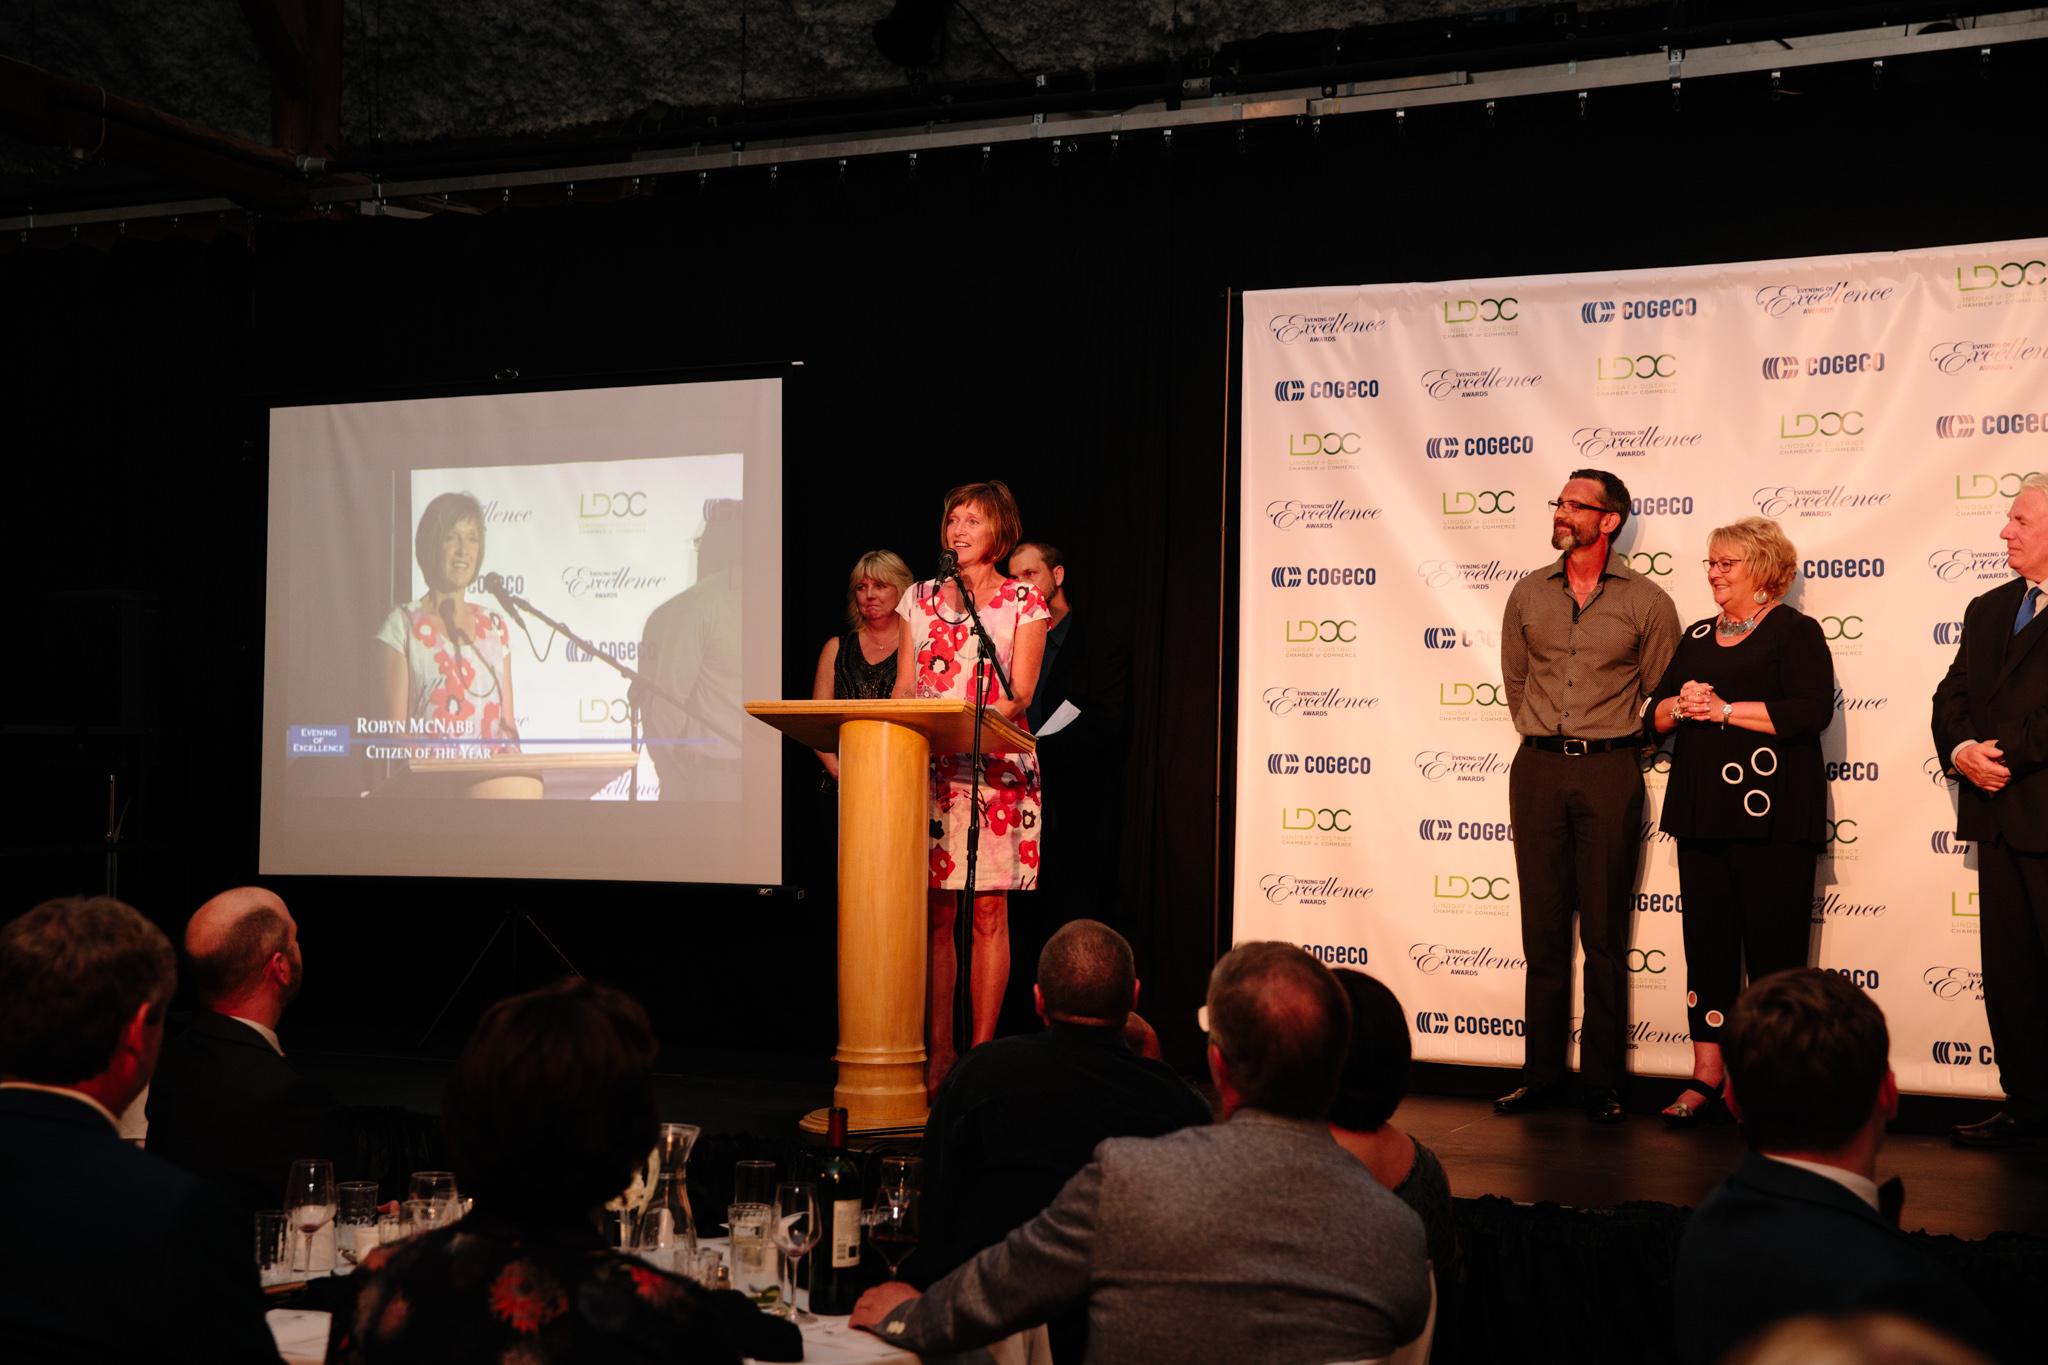 acceptance speech for volunteer award